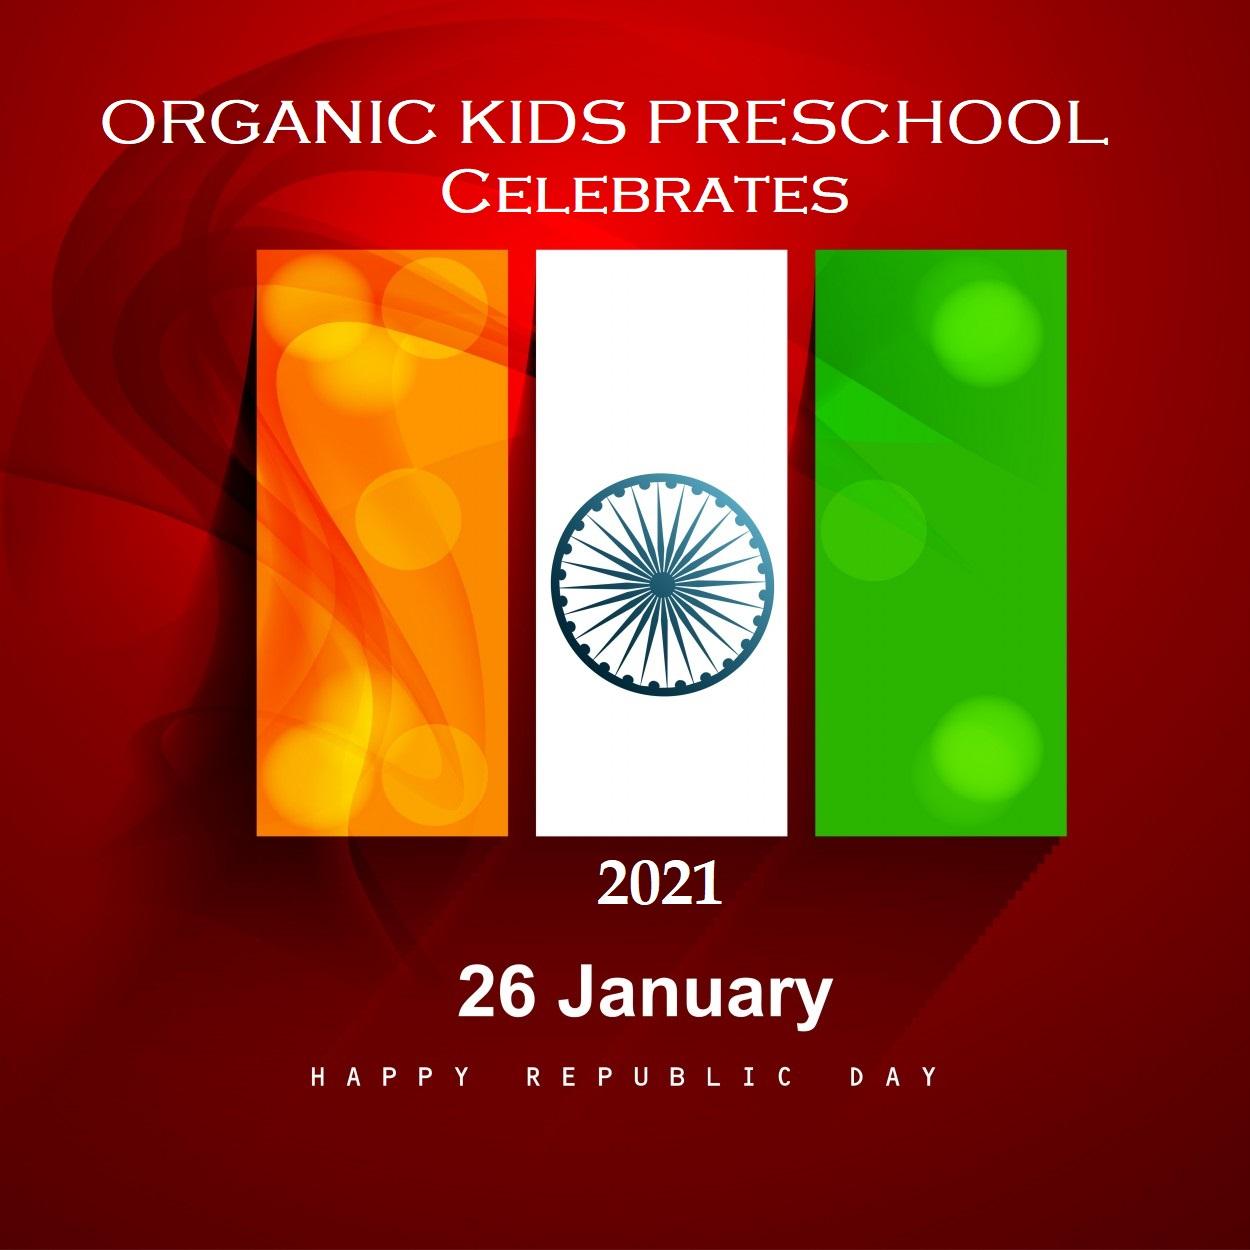 Republic Day poster Organic Kids Preschool 2